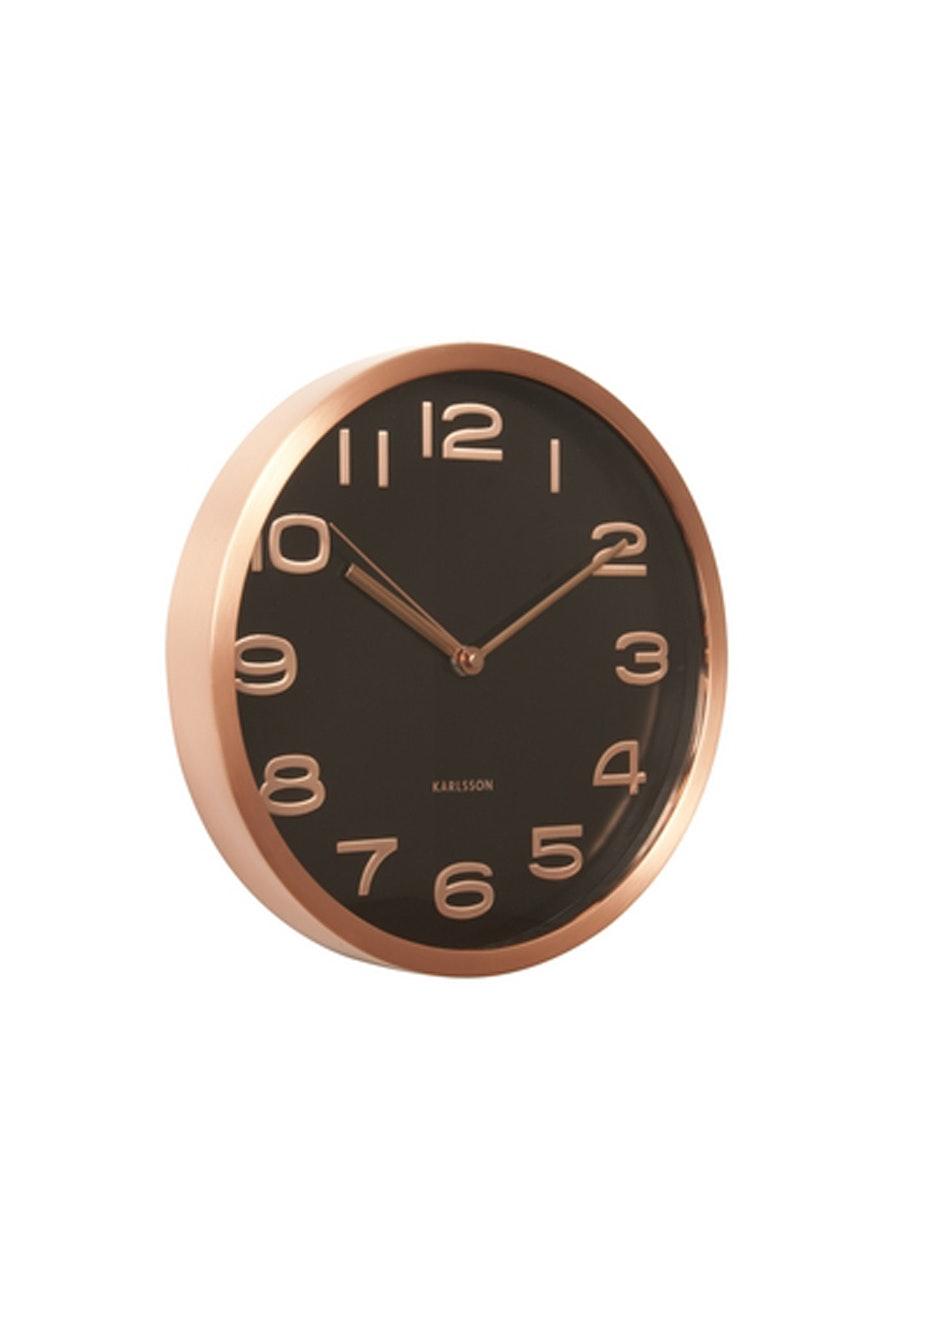 Karlsson - Wall Clock 'Maxie' - Copper/Black